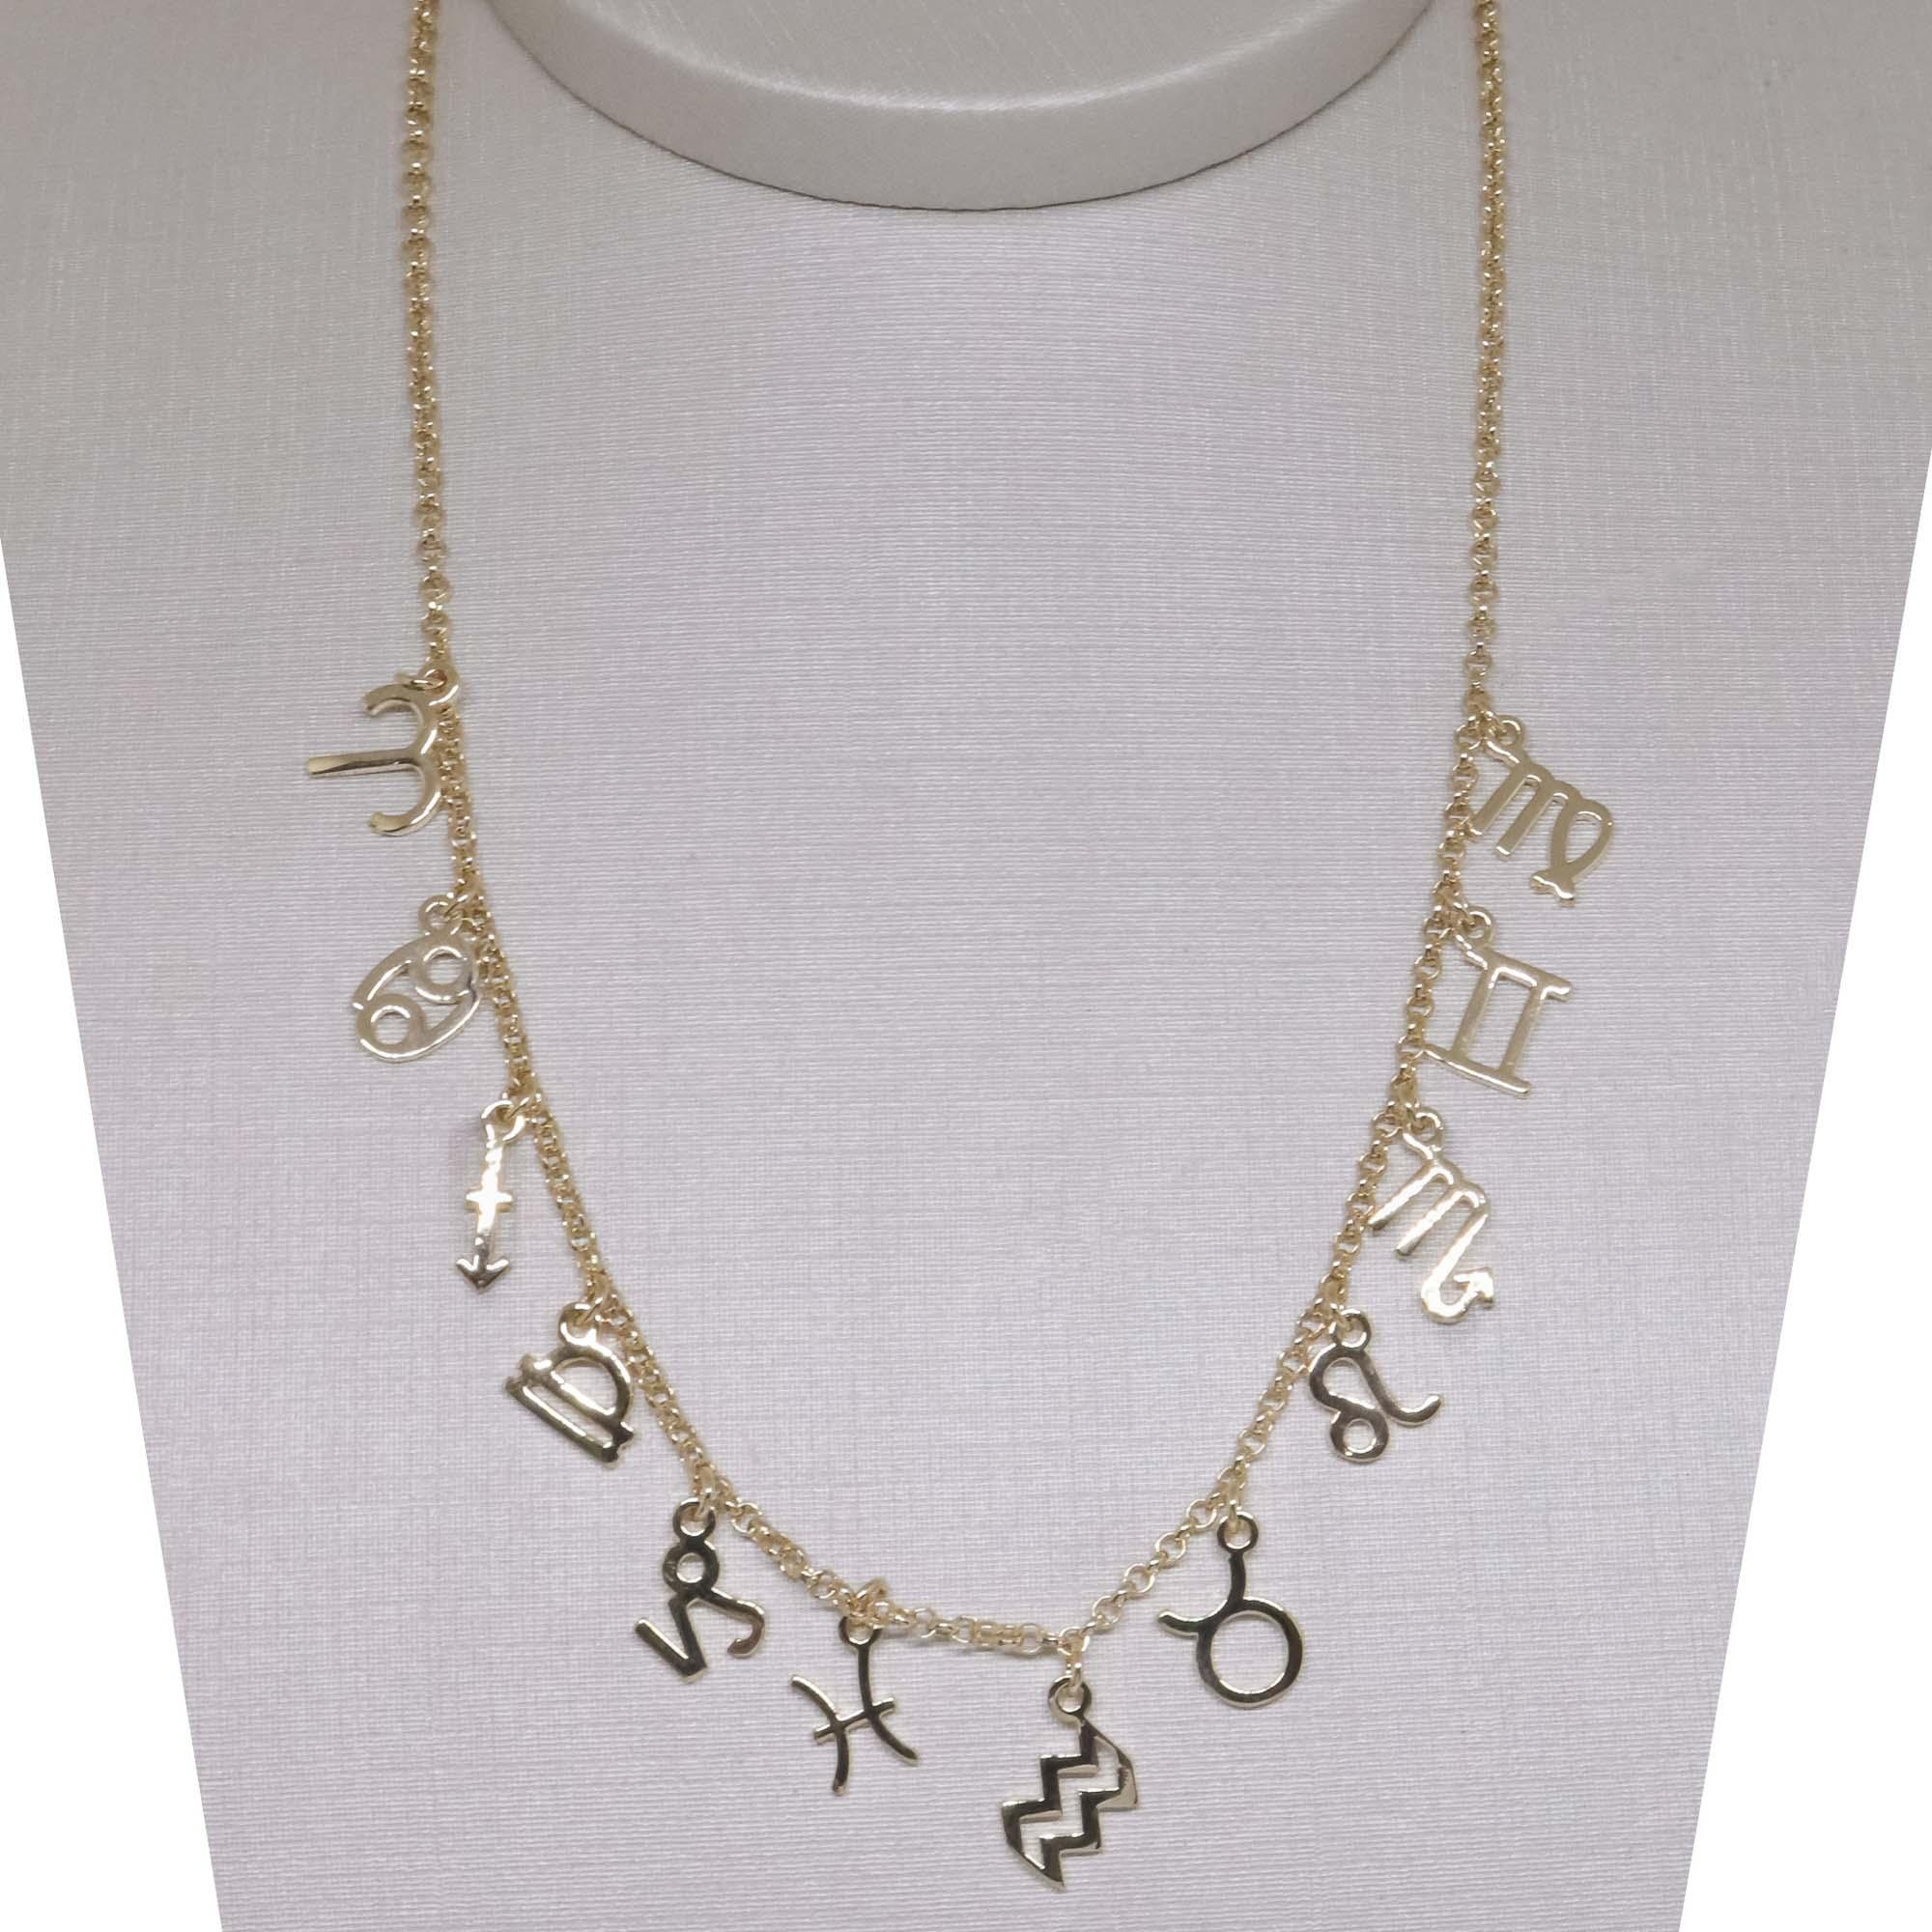 Colar Choker Semi joia Signos banhada a ouro 18k ou rhodium